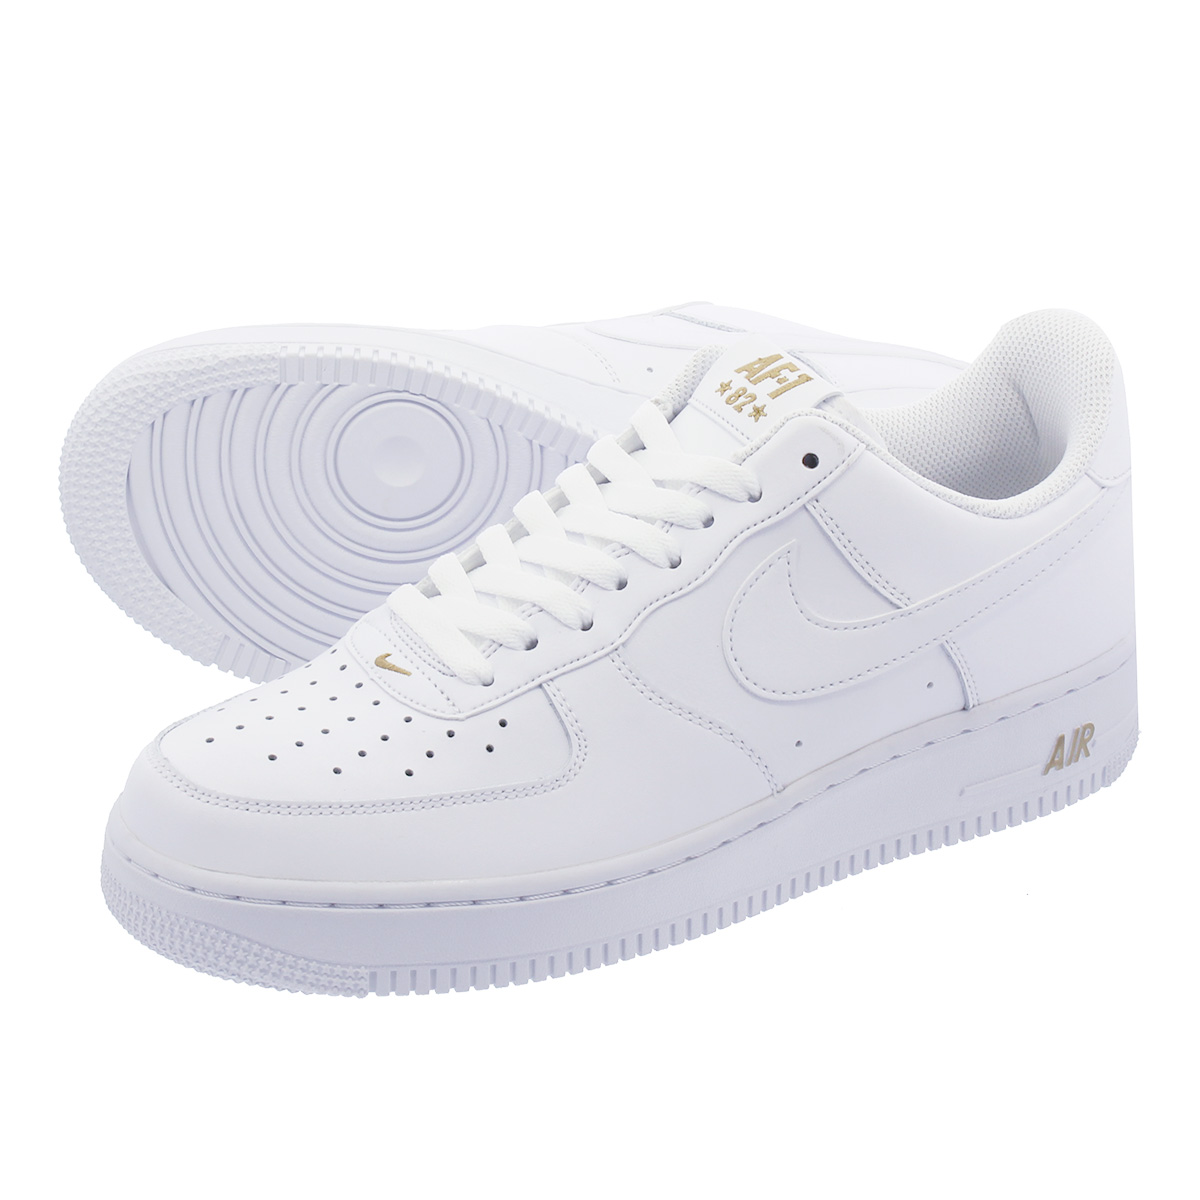 innovative design fc7a0 9f7b2 NIKE AIR FORCE 1  07 Nike air force 1  07 WHITE METALLIC GOLD aa4083-102